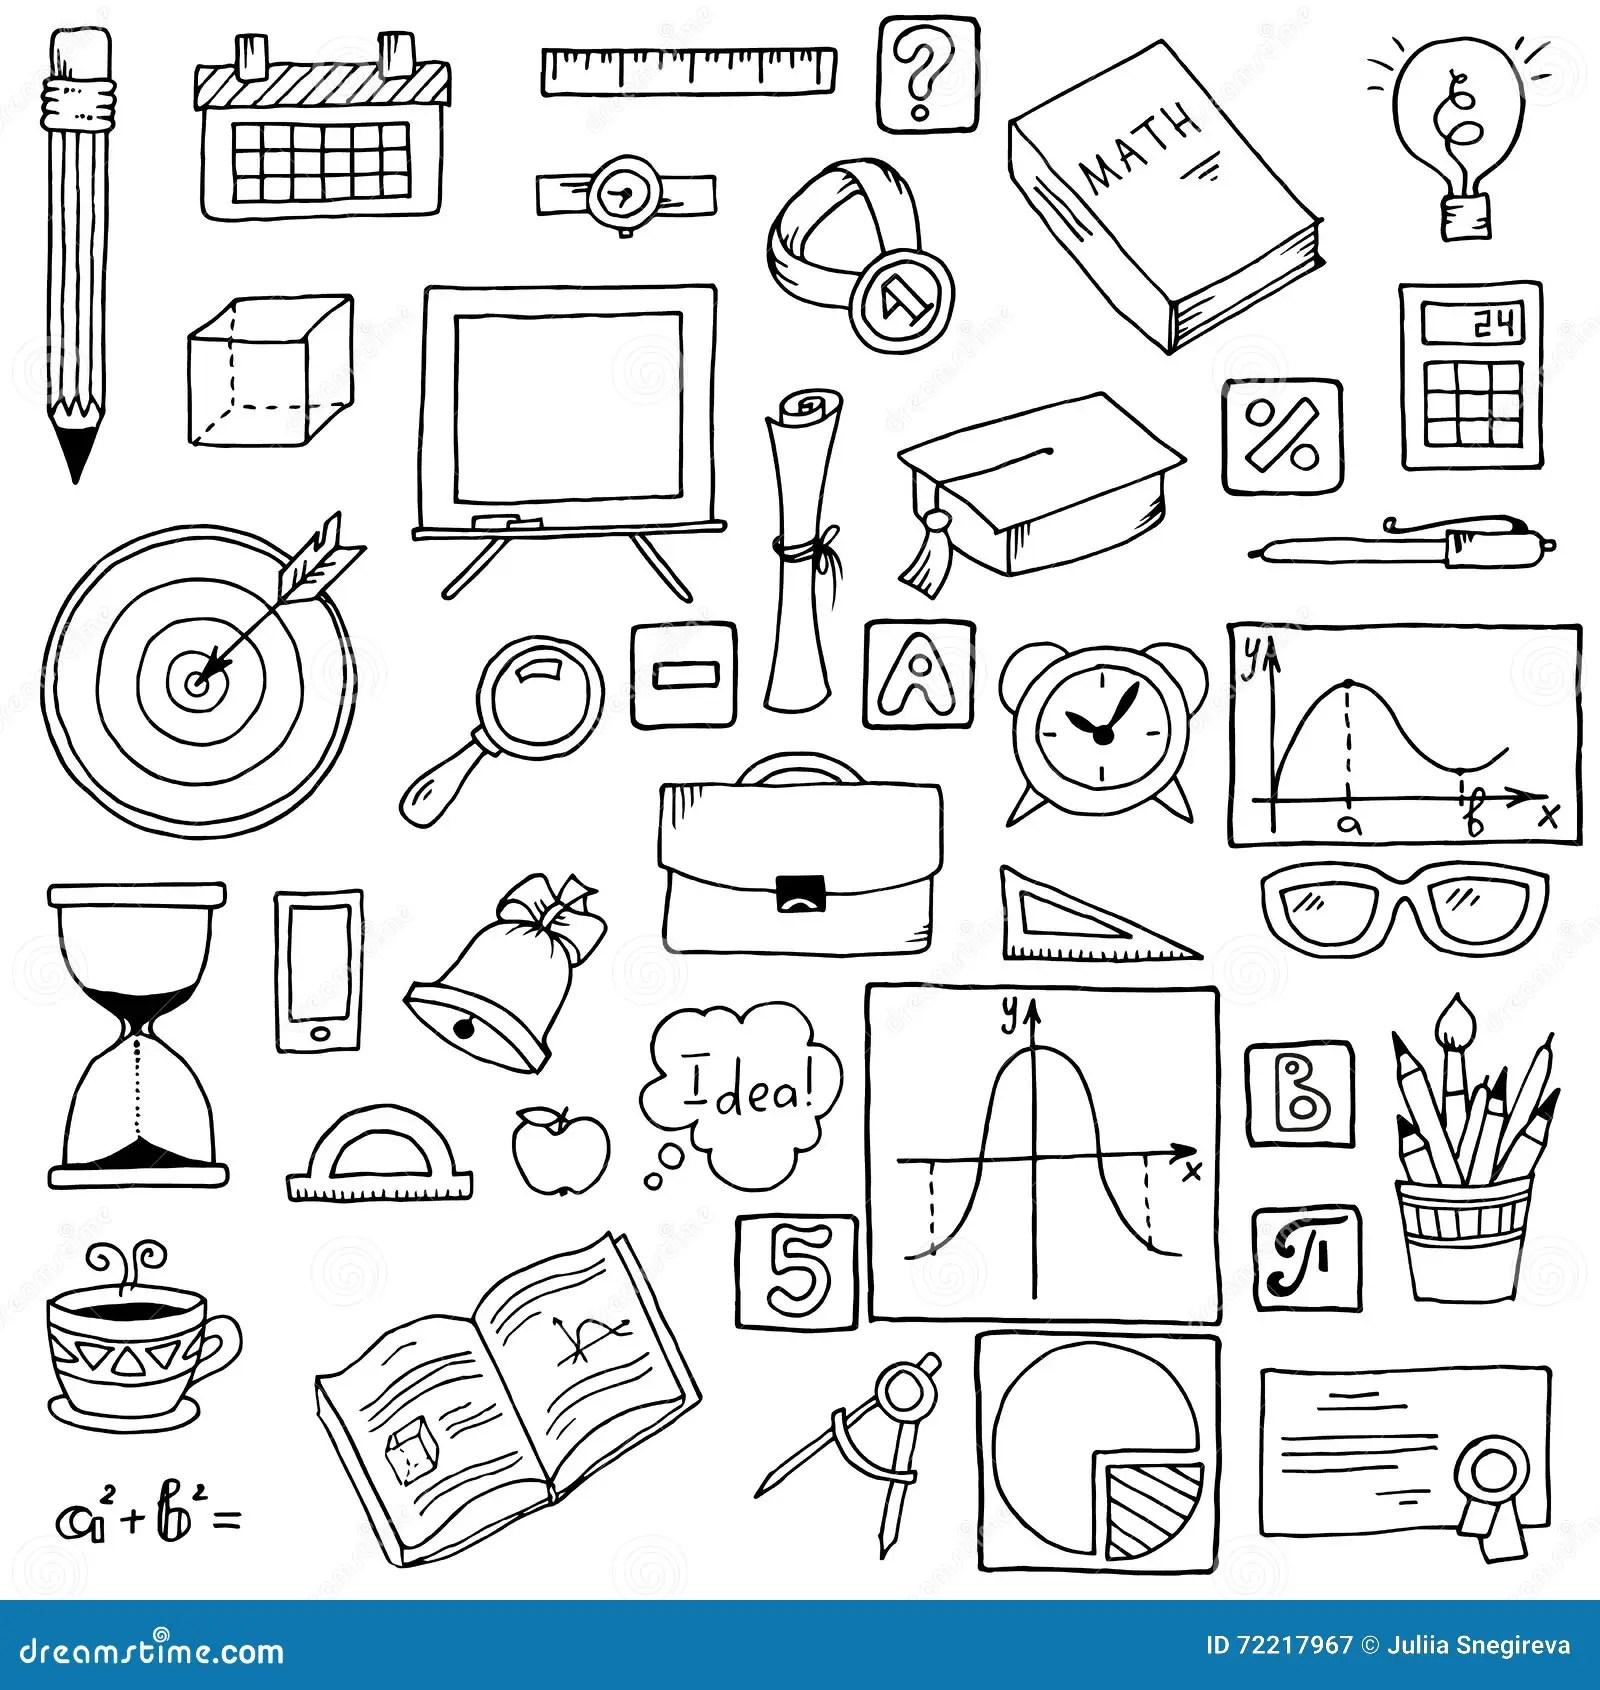 Illustration Of Icons On A Mathematics Theme. Stock Vector